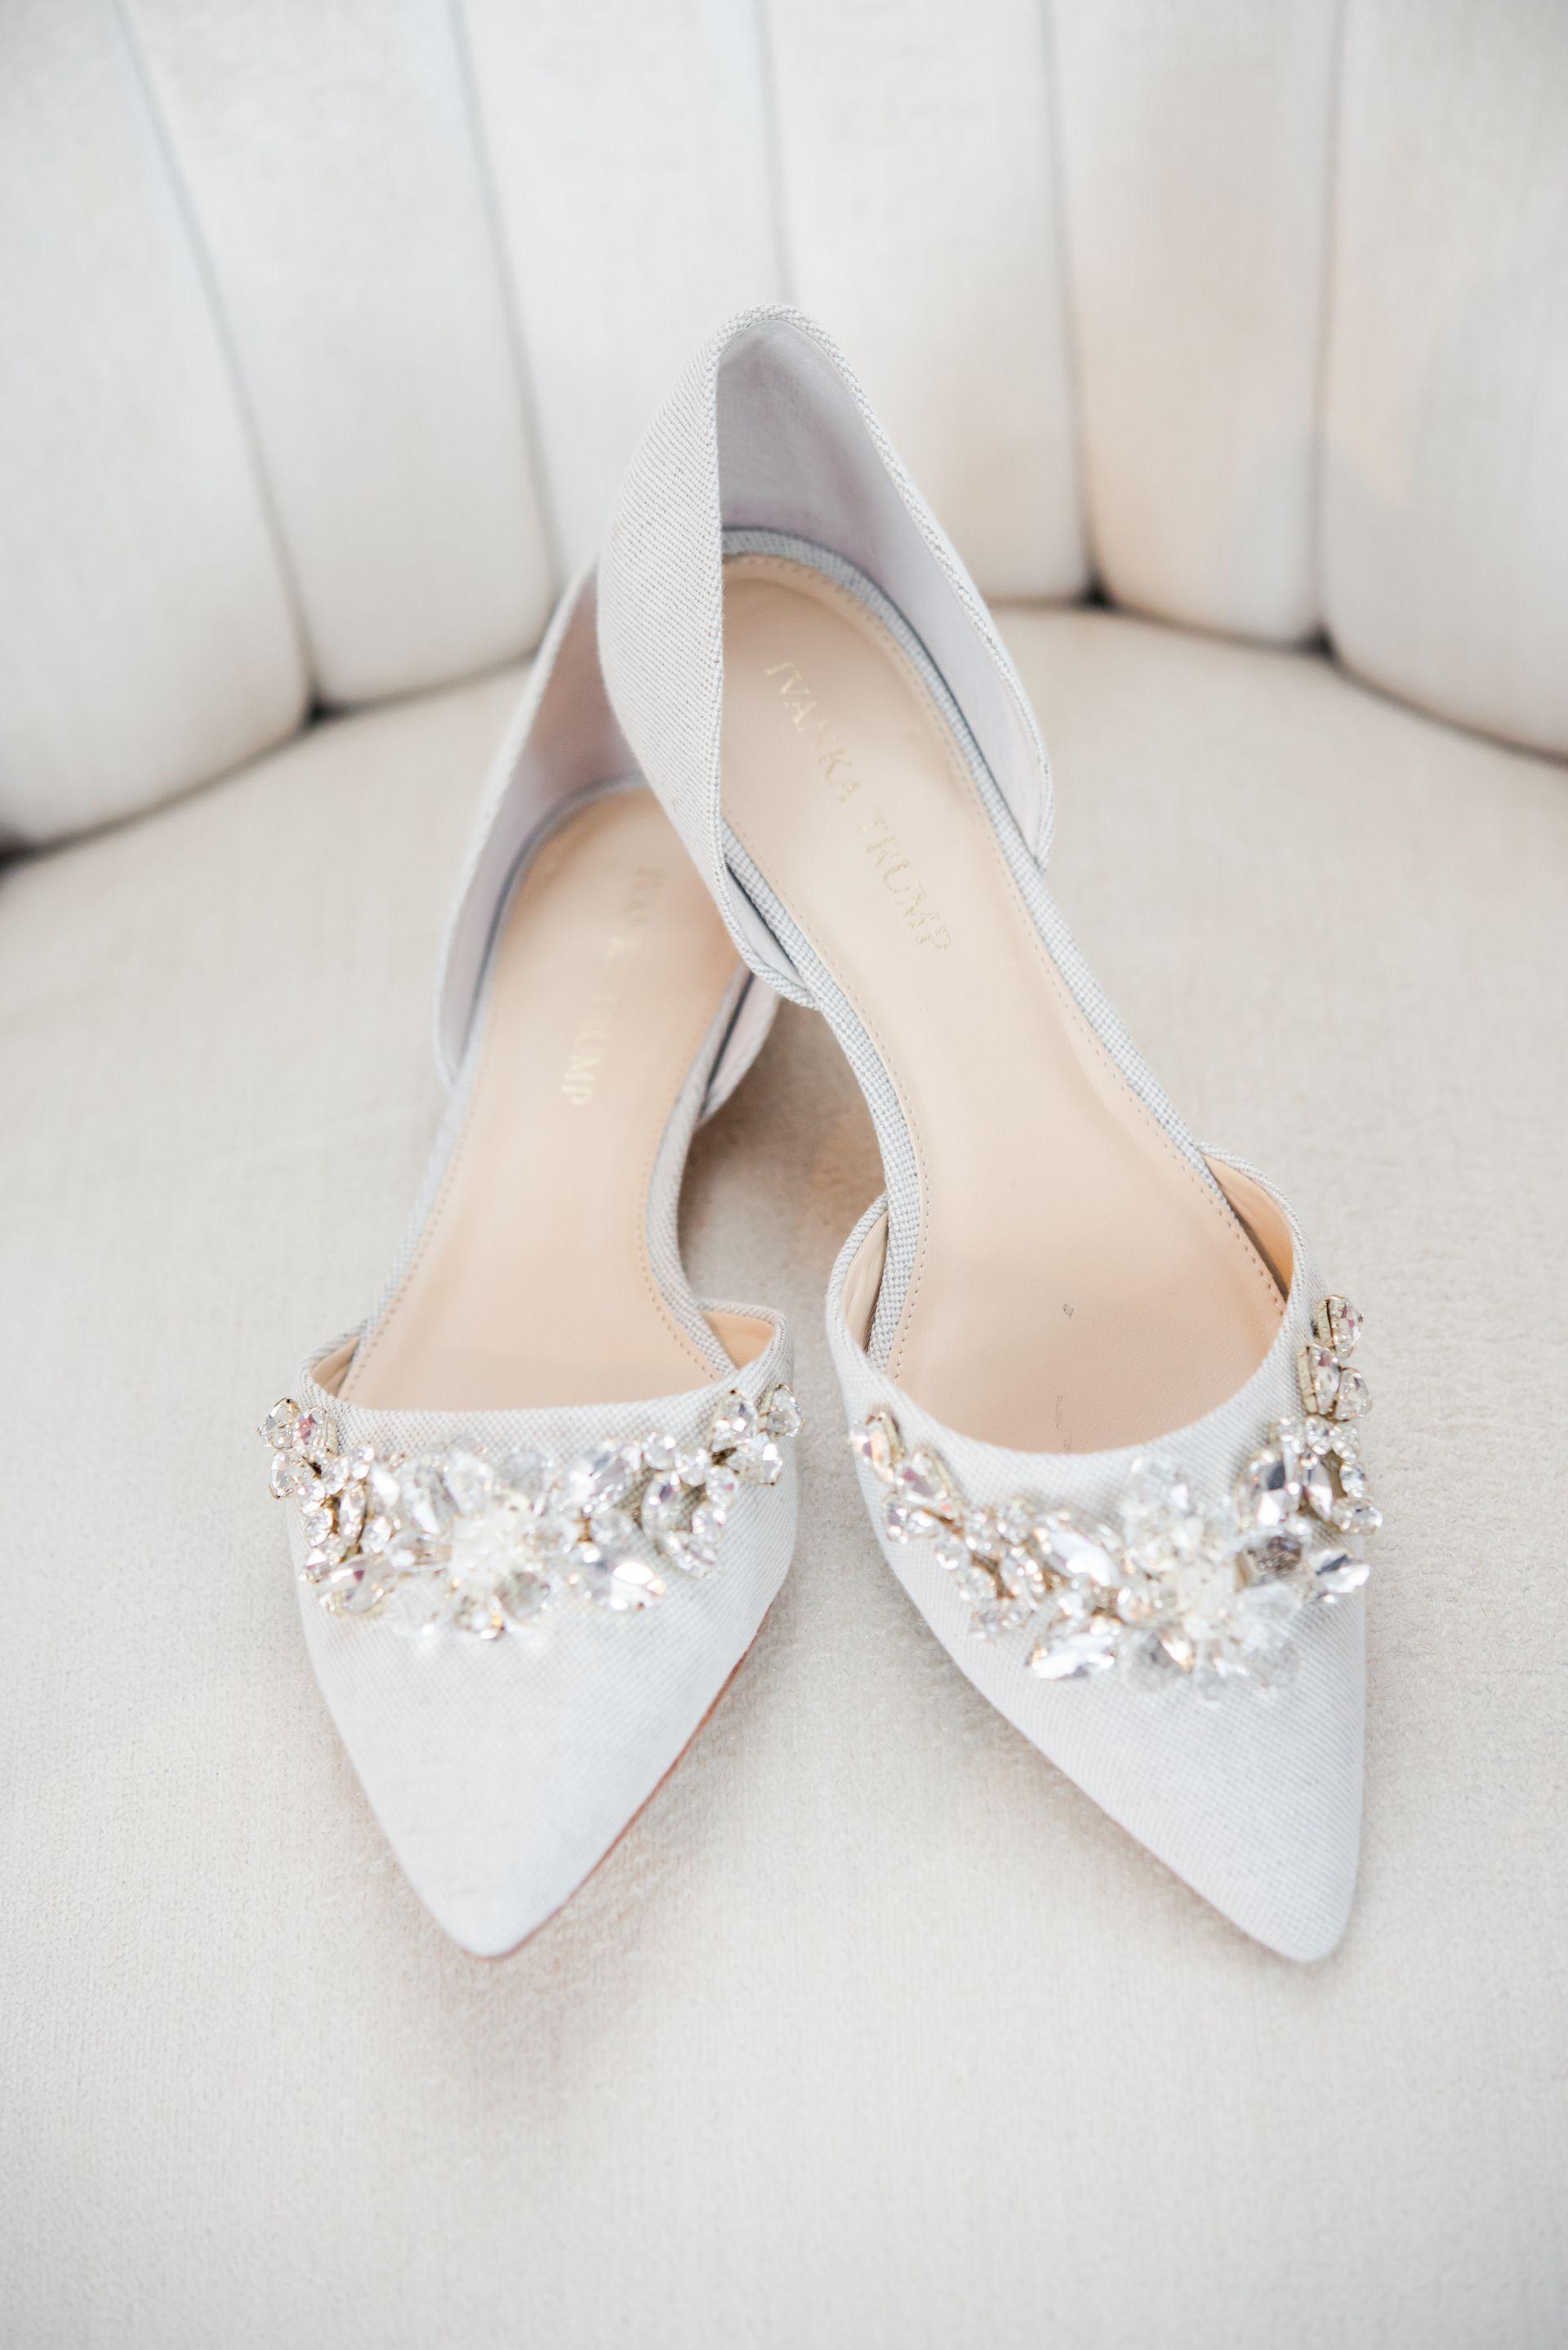 Glitzy D 39 Orsay Heels Classic Meets Glamorous White Bridal Shoes Diamond Embellishments Daisy Sau Wedding Shoes Bridal Shoes Wedding Shoes Comfortable